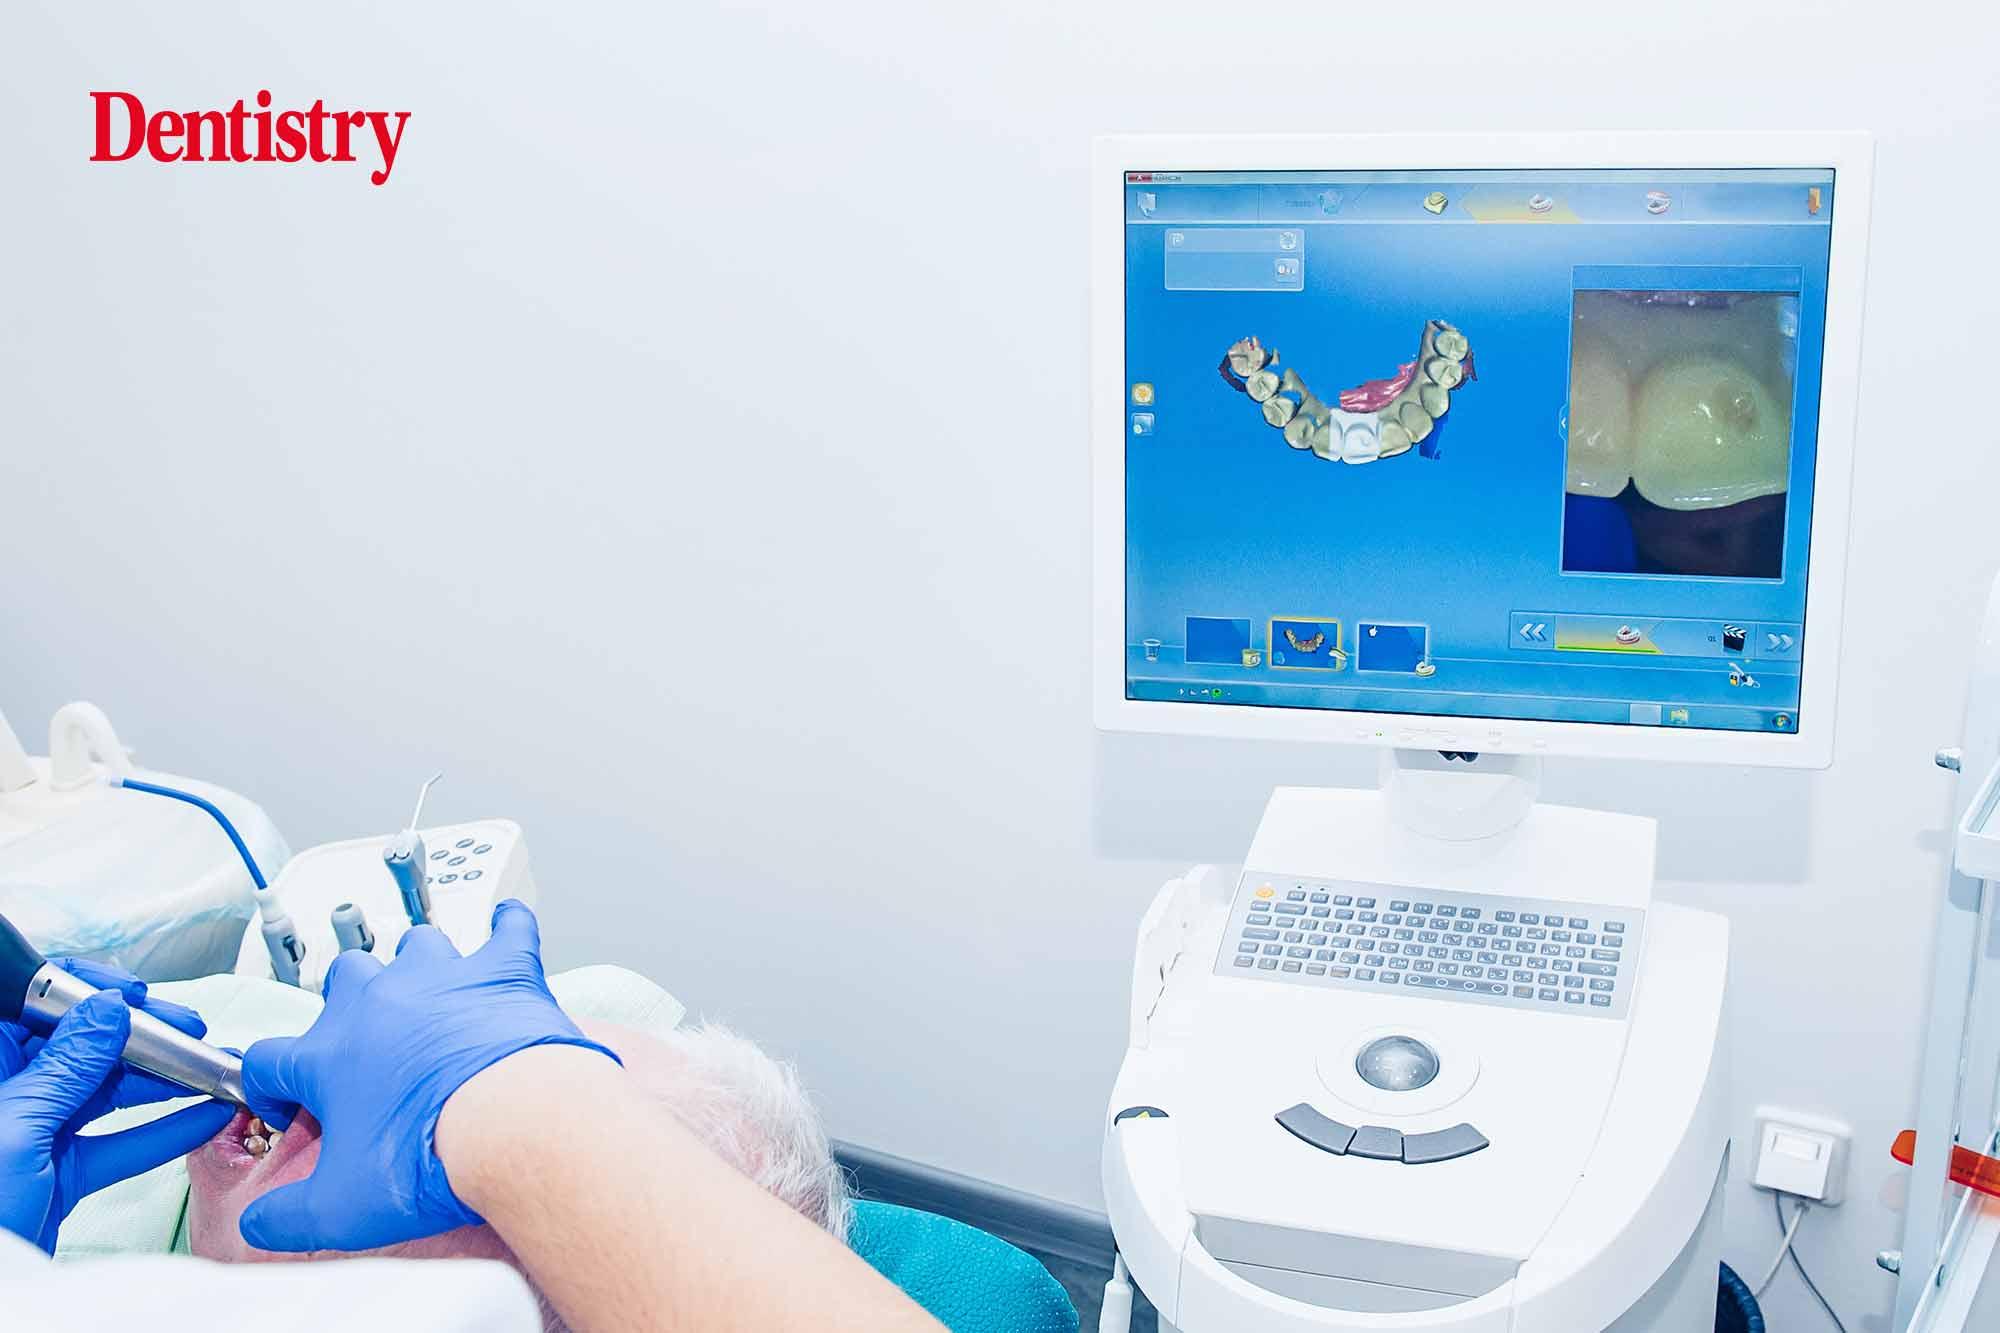 digital dentures